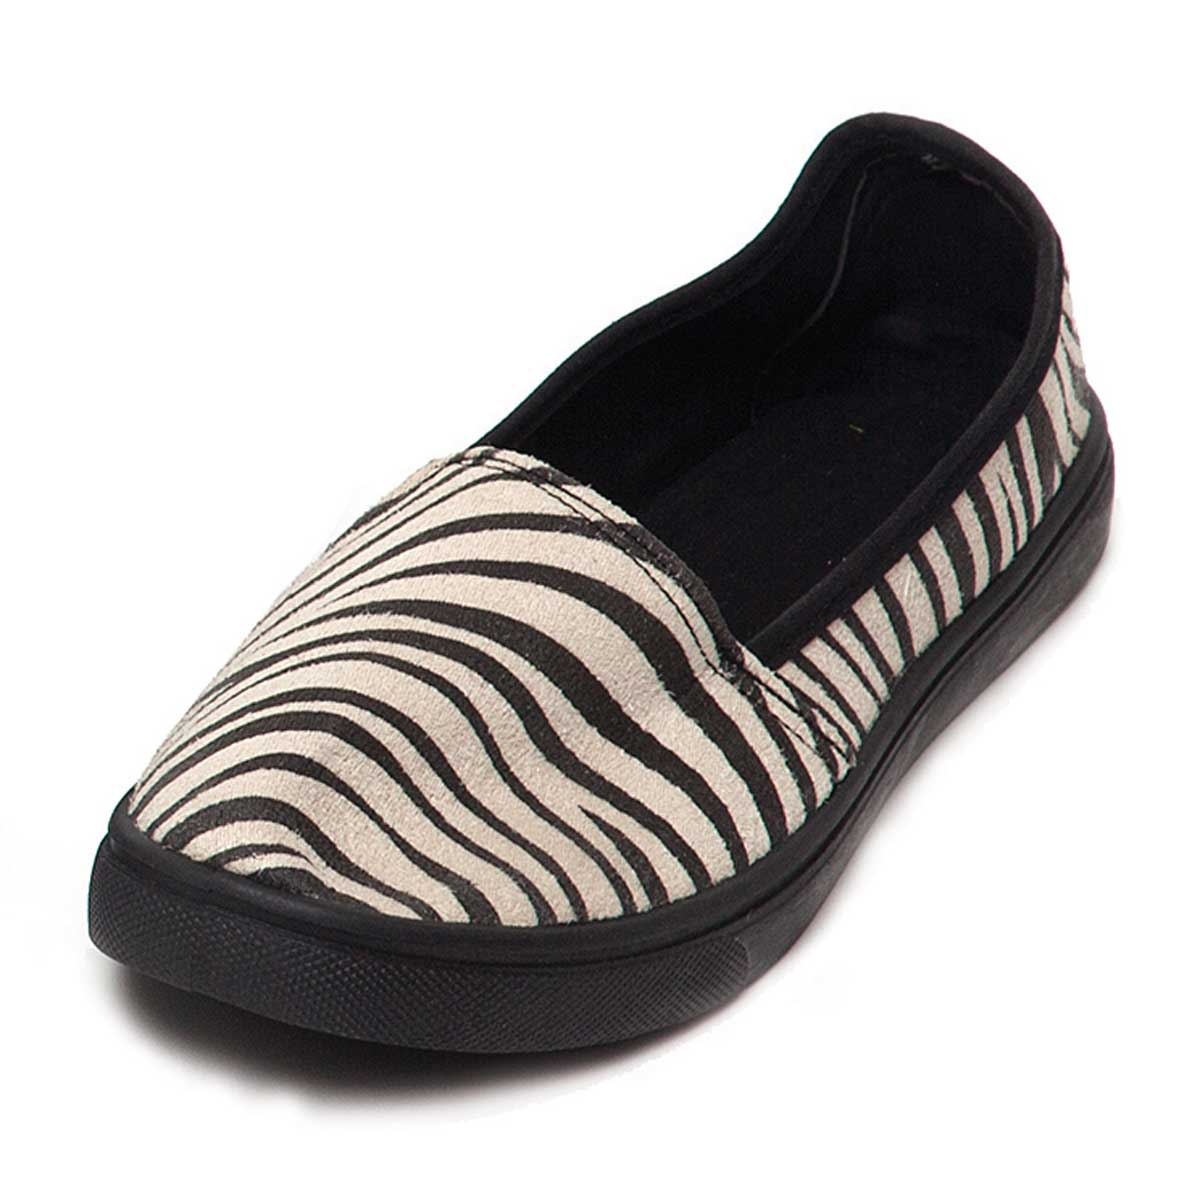 Black/Cream Zebra Espadrille Size 6